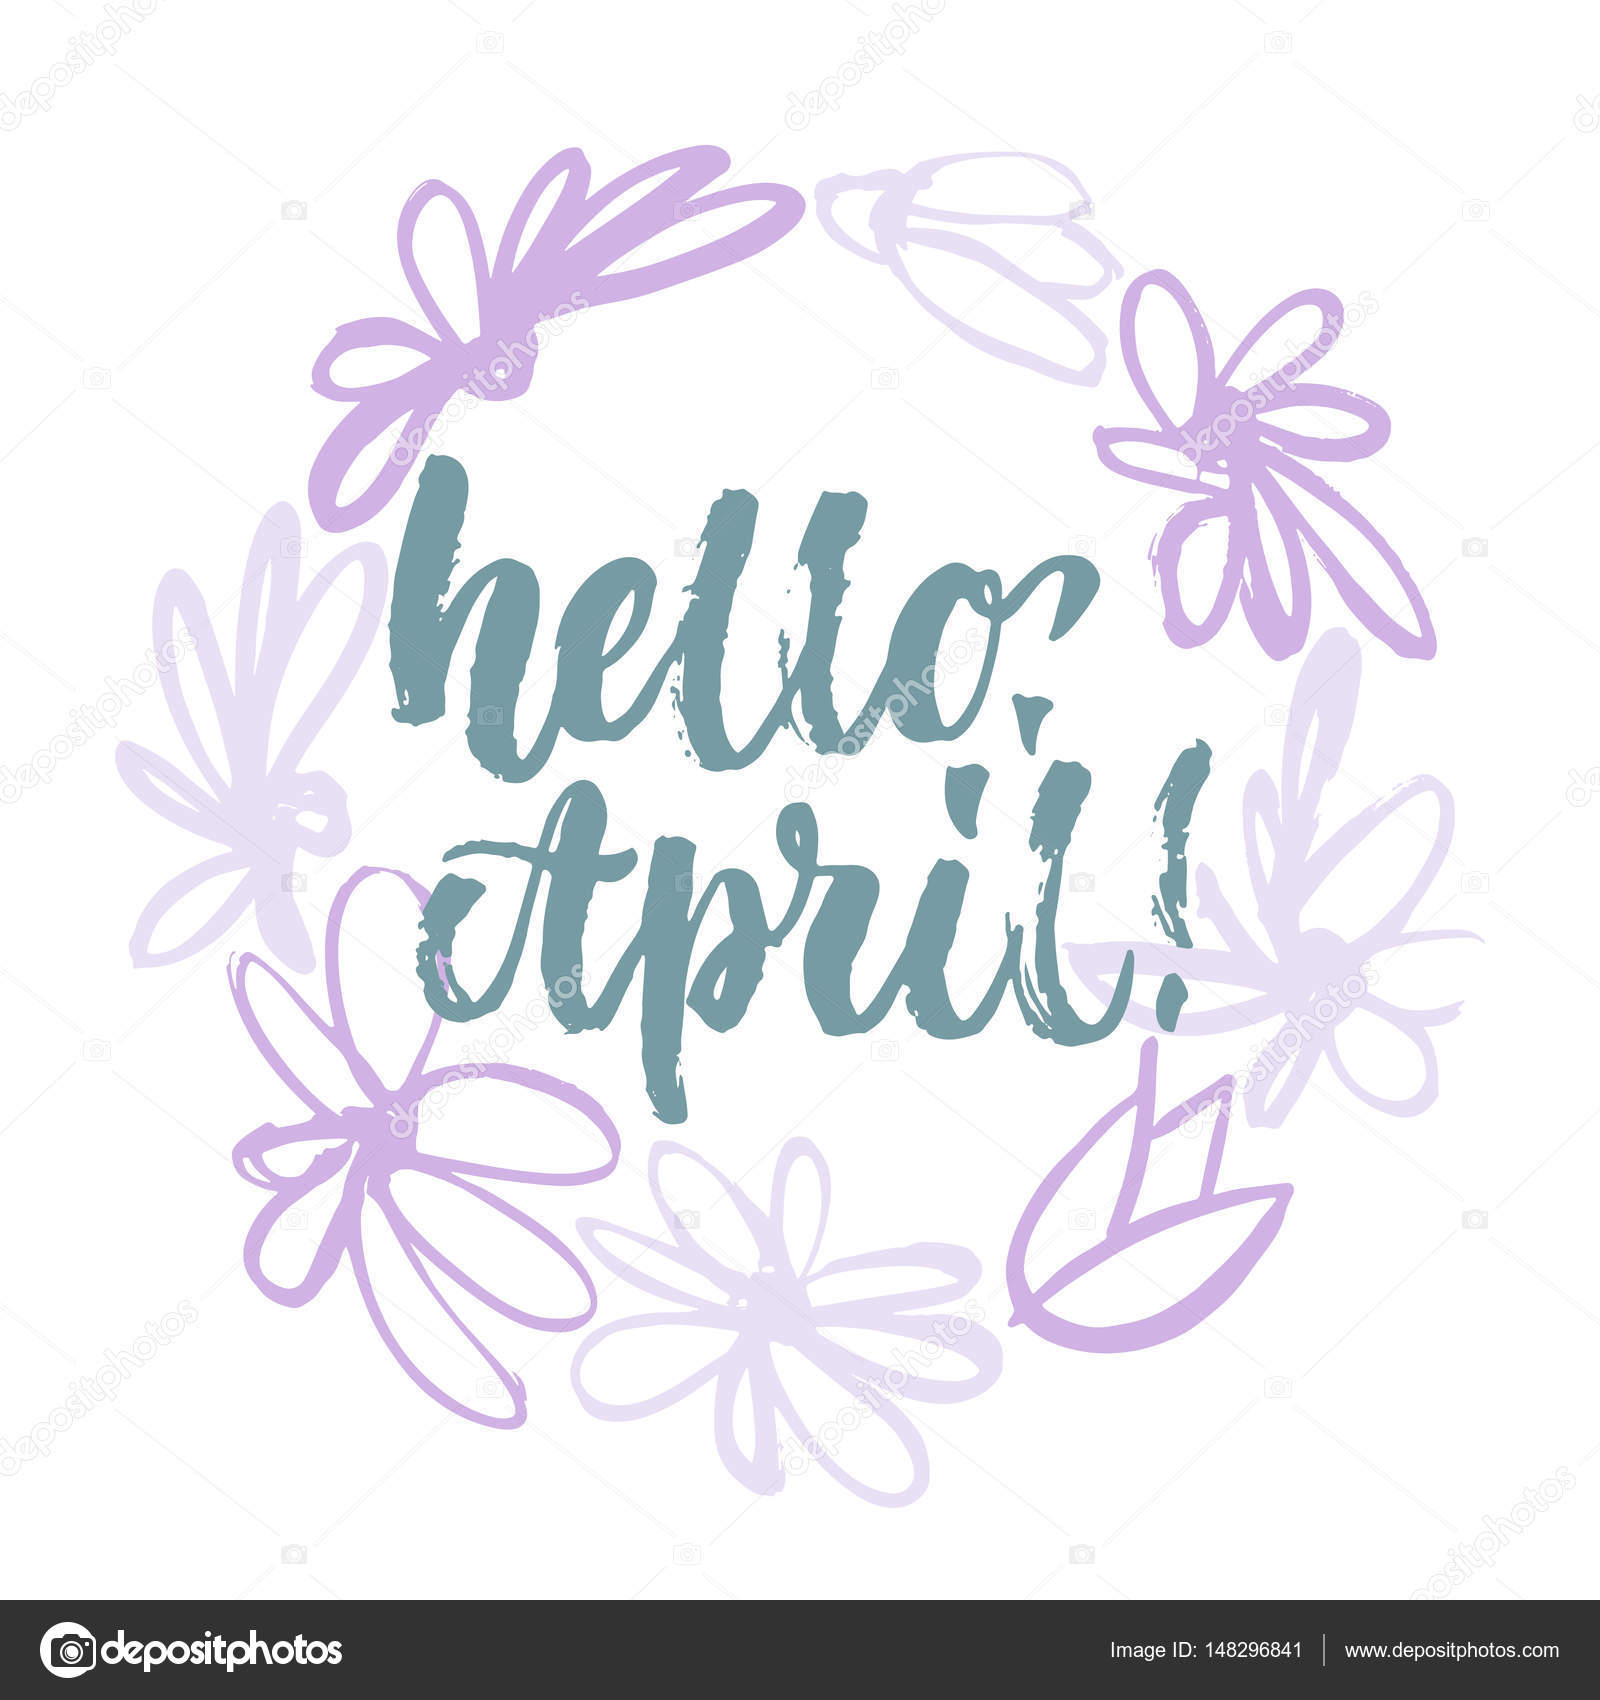 Hello april handwritten lettering calligraphy in the sketch hand hello april handwritten lettering calligraphy in the sketch hand drawn flowers wreath stock vector altavistaventures Image collections